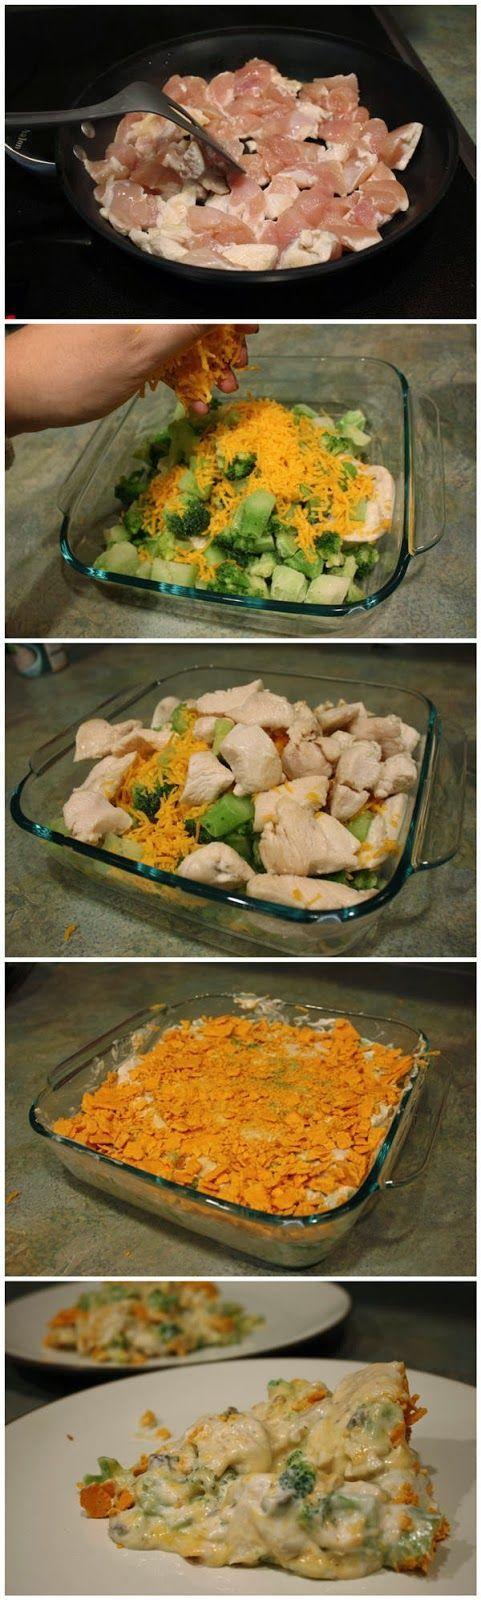 Recipe Skinny Chicken And Broccoli Casserole  Food Worth -5420